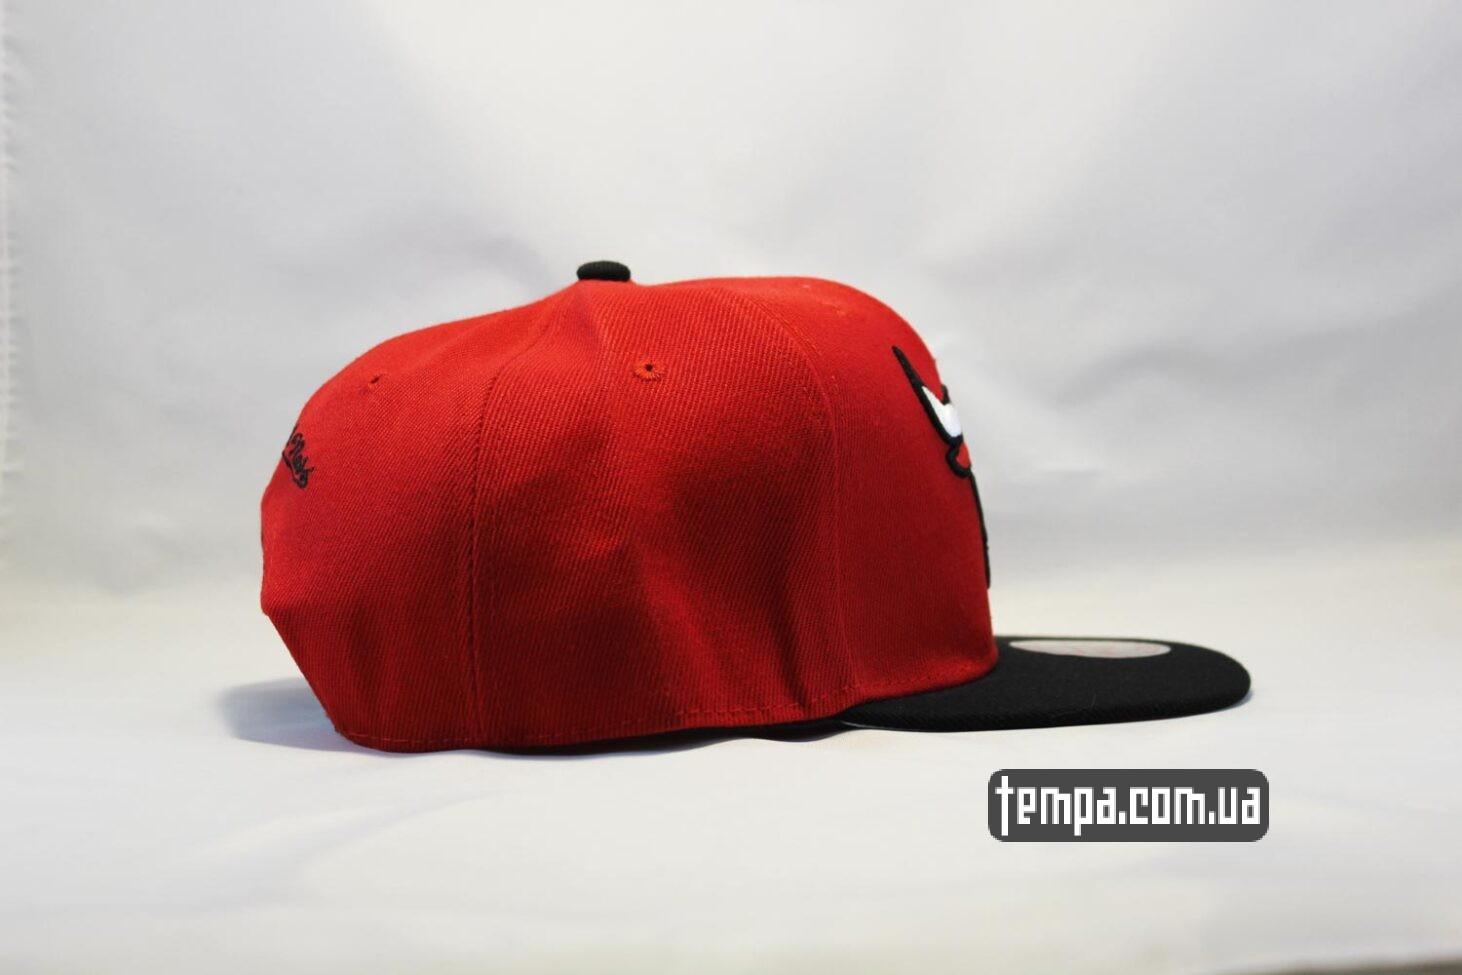 Red красная бык кепка snapback Chicago Bulls New Era красная с быком